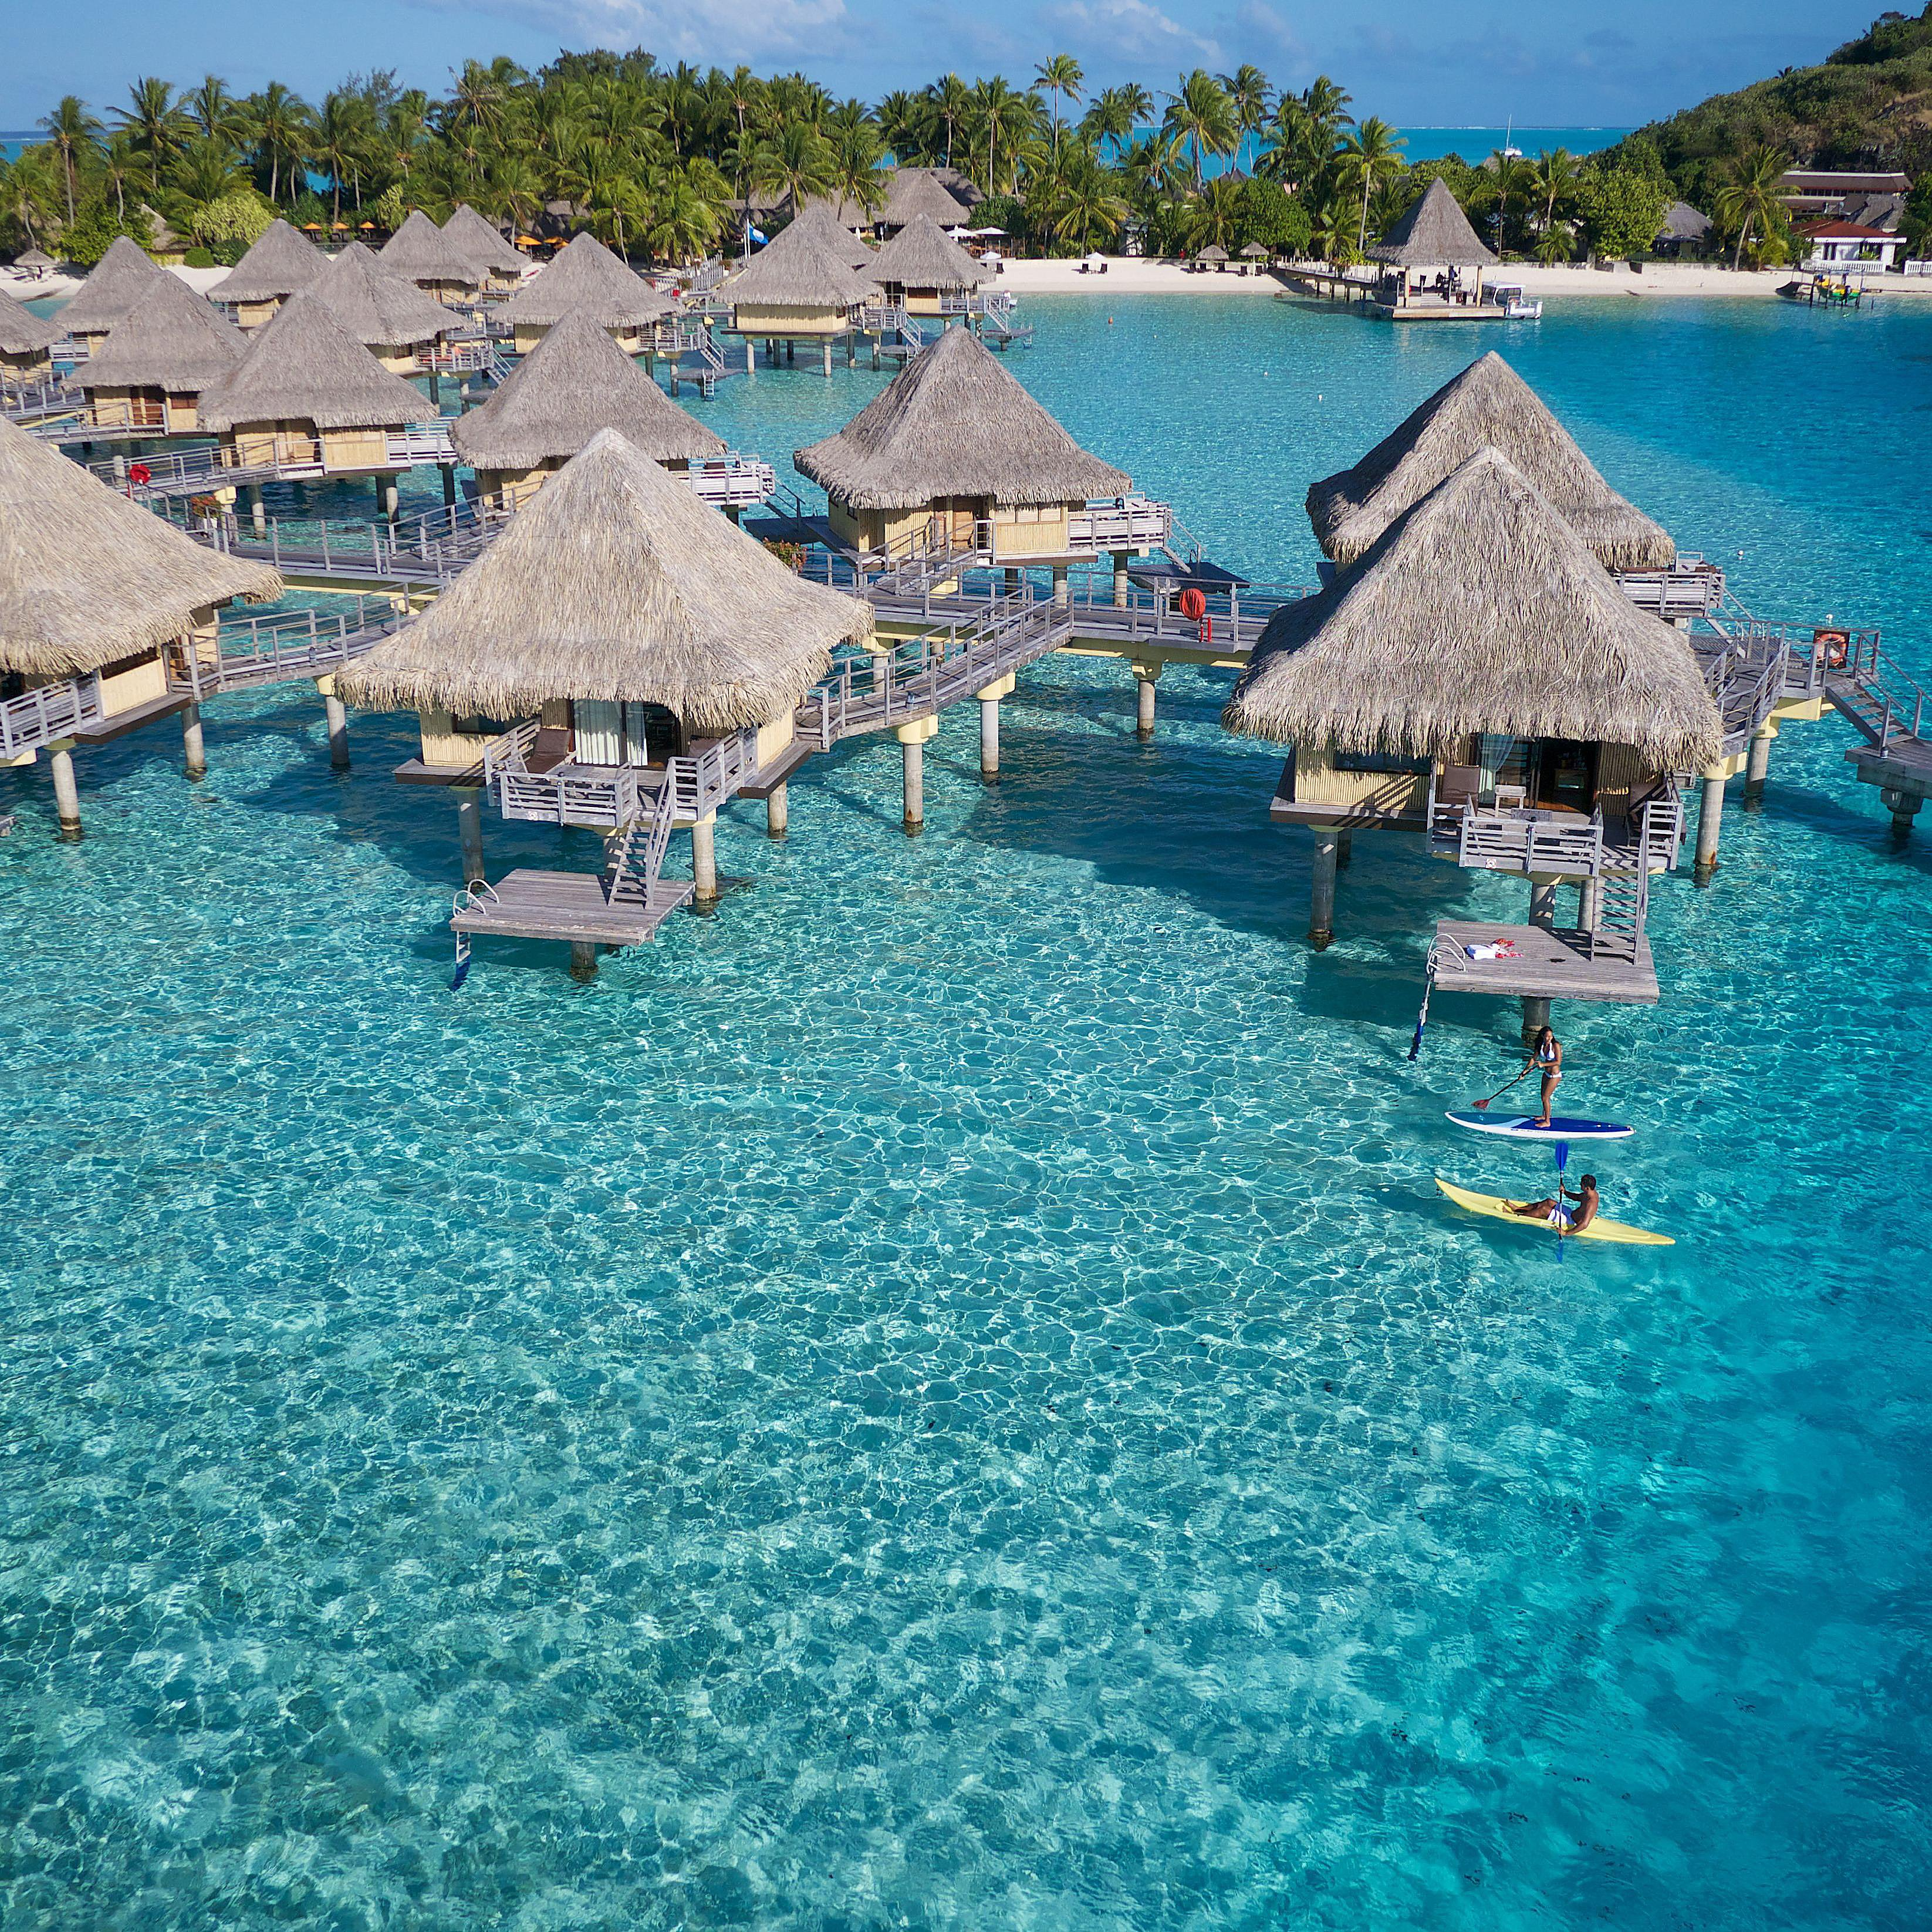 Intercontinental Le Moana Bora Bora Bora Bora